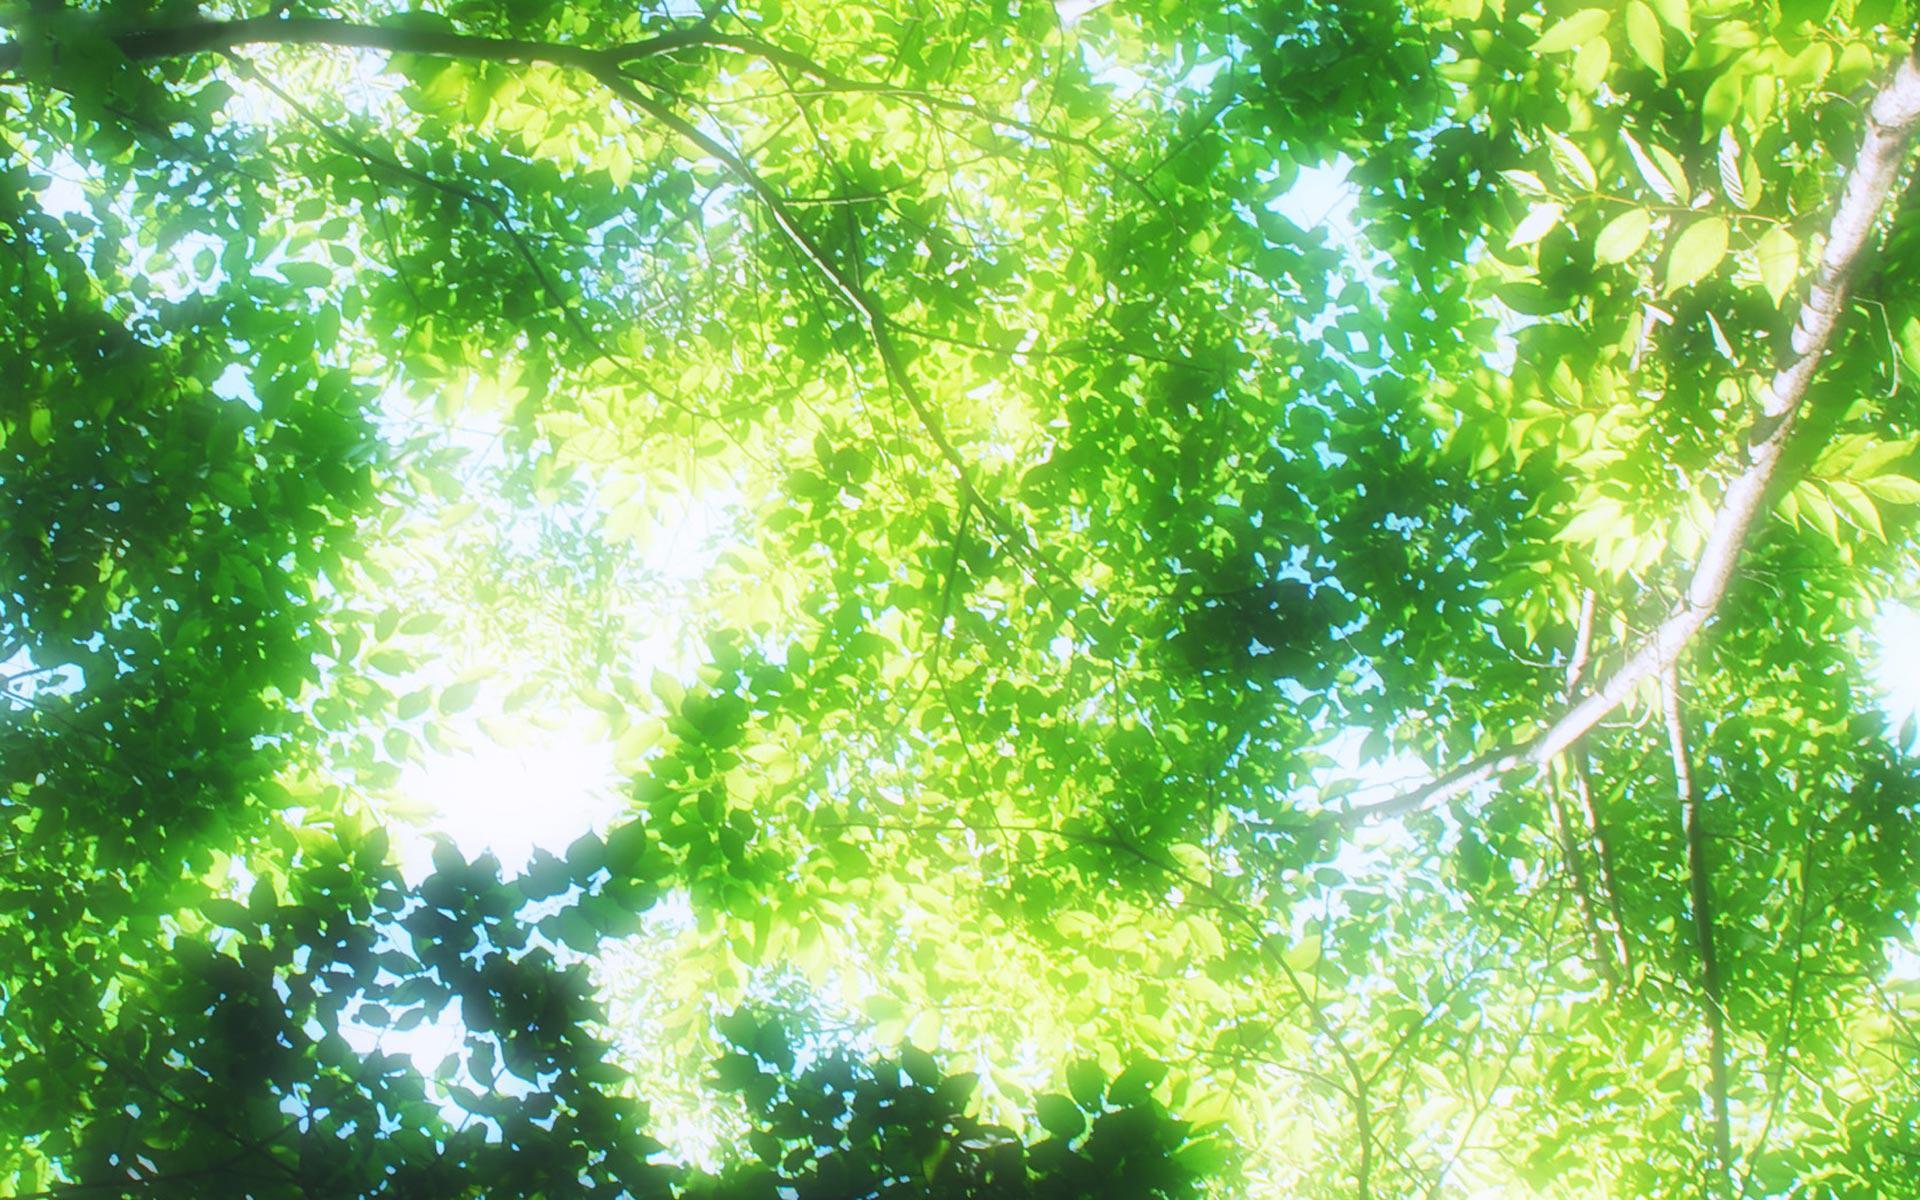 Serenidad [Social Abierto - Albert, etc.] 36426_anime_scenery